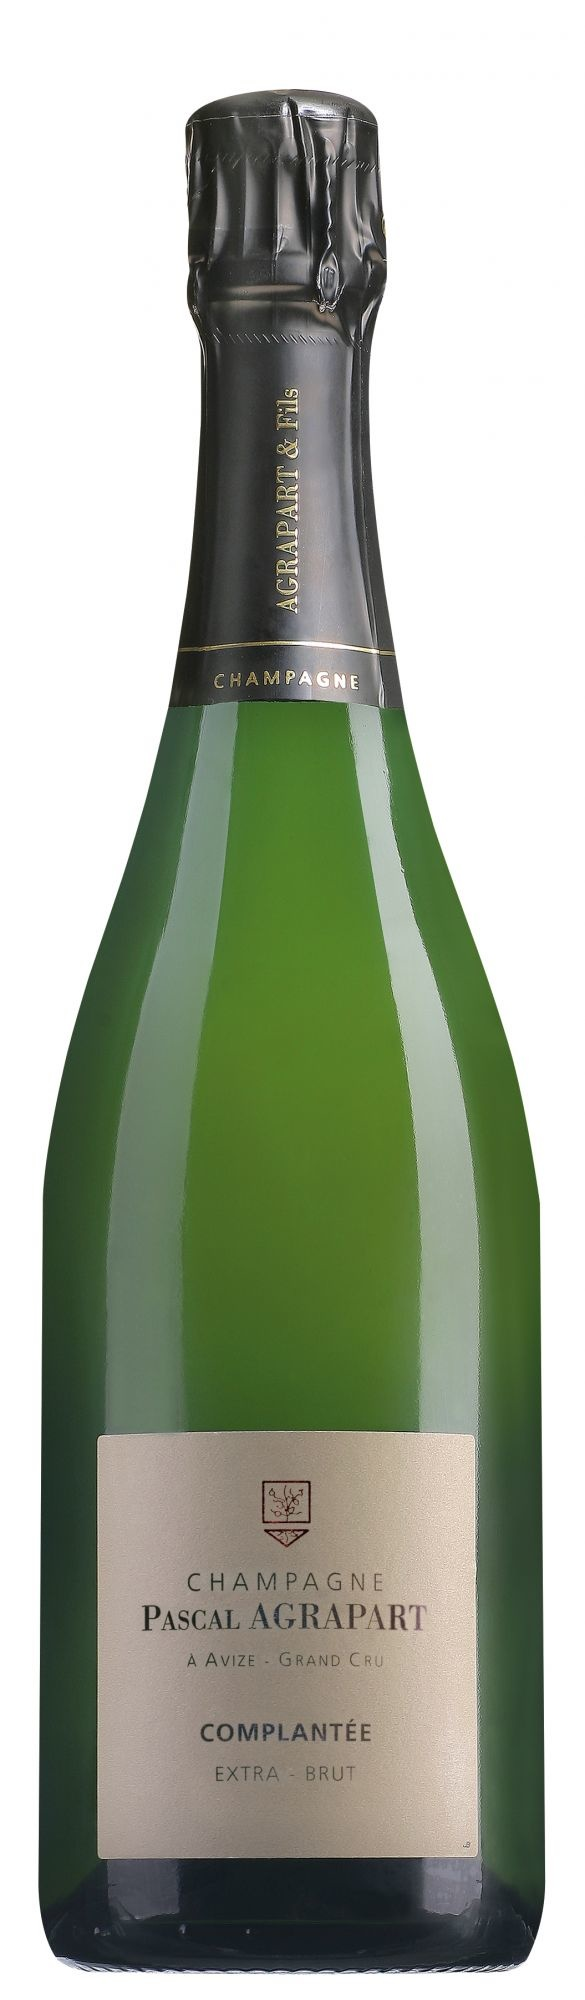 Agrapart Champagner Grand Cru Complantée Extra Brut